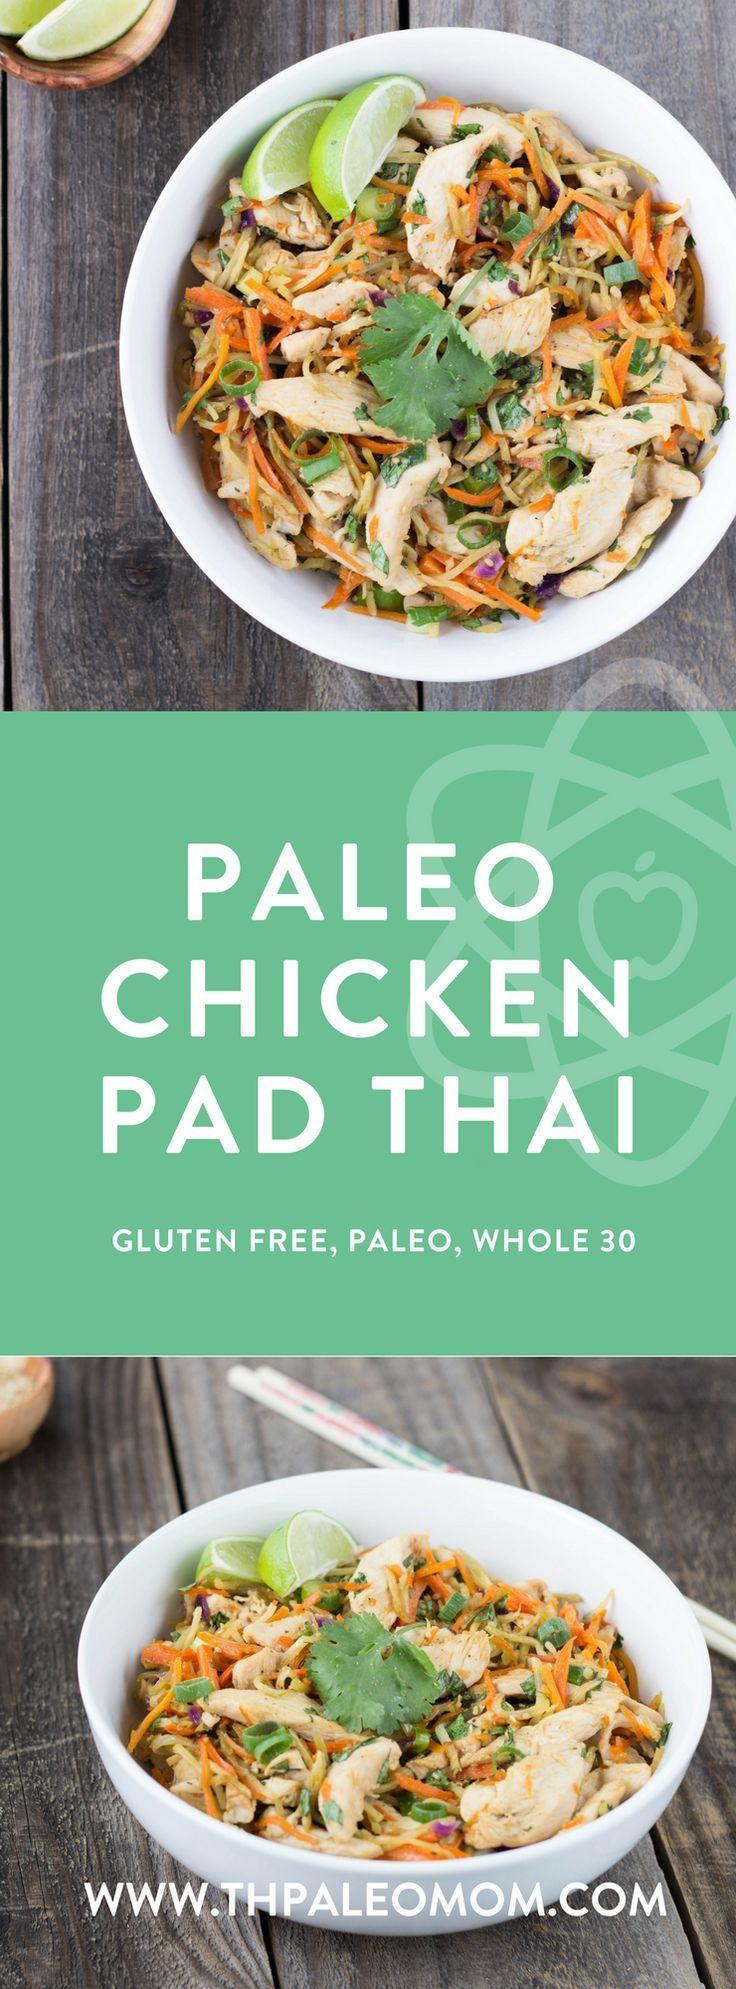 Paleo Chicken Pad Thai #fishmeal